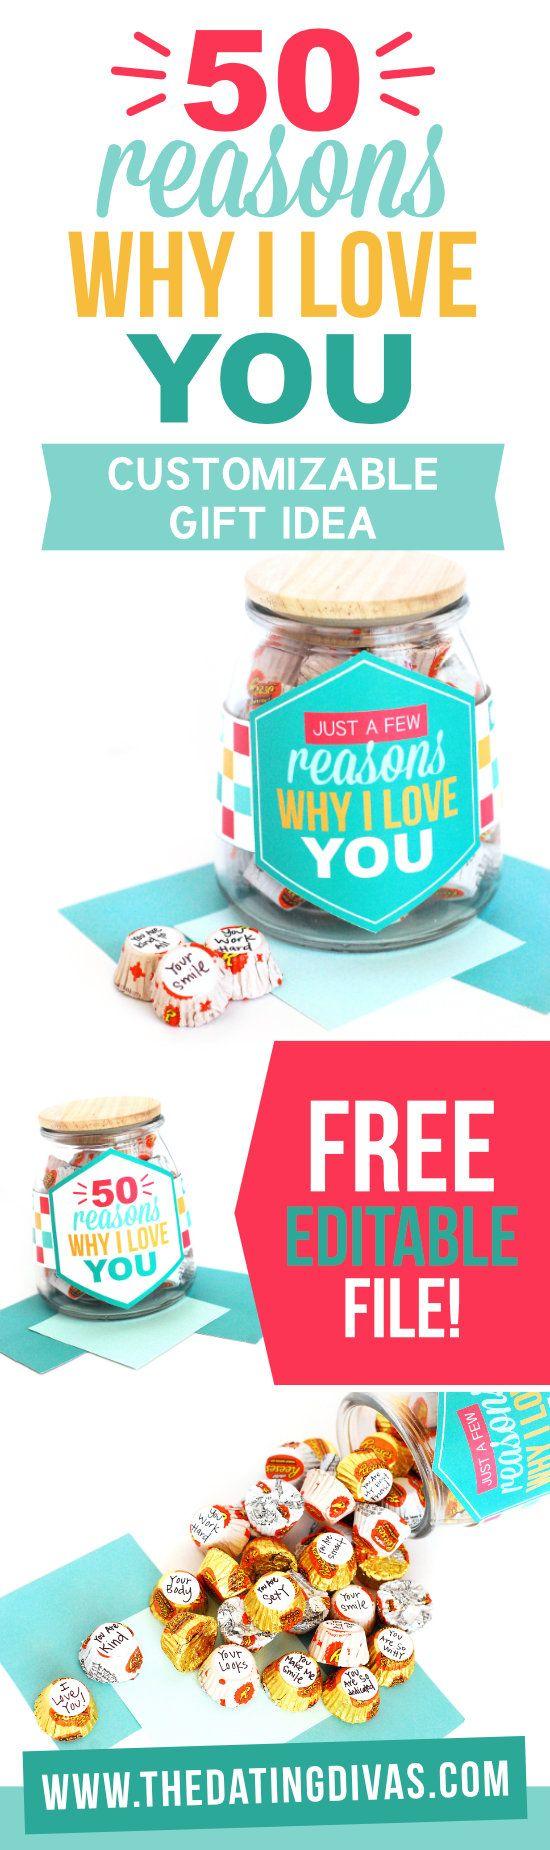 50 Reasons Why I Love Gift Idea #easygift #romanticidea